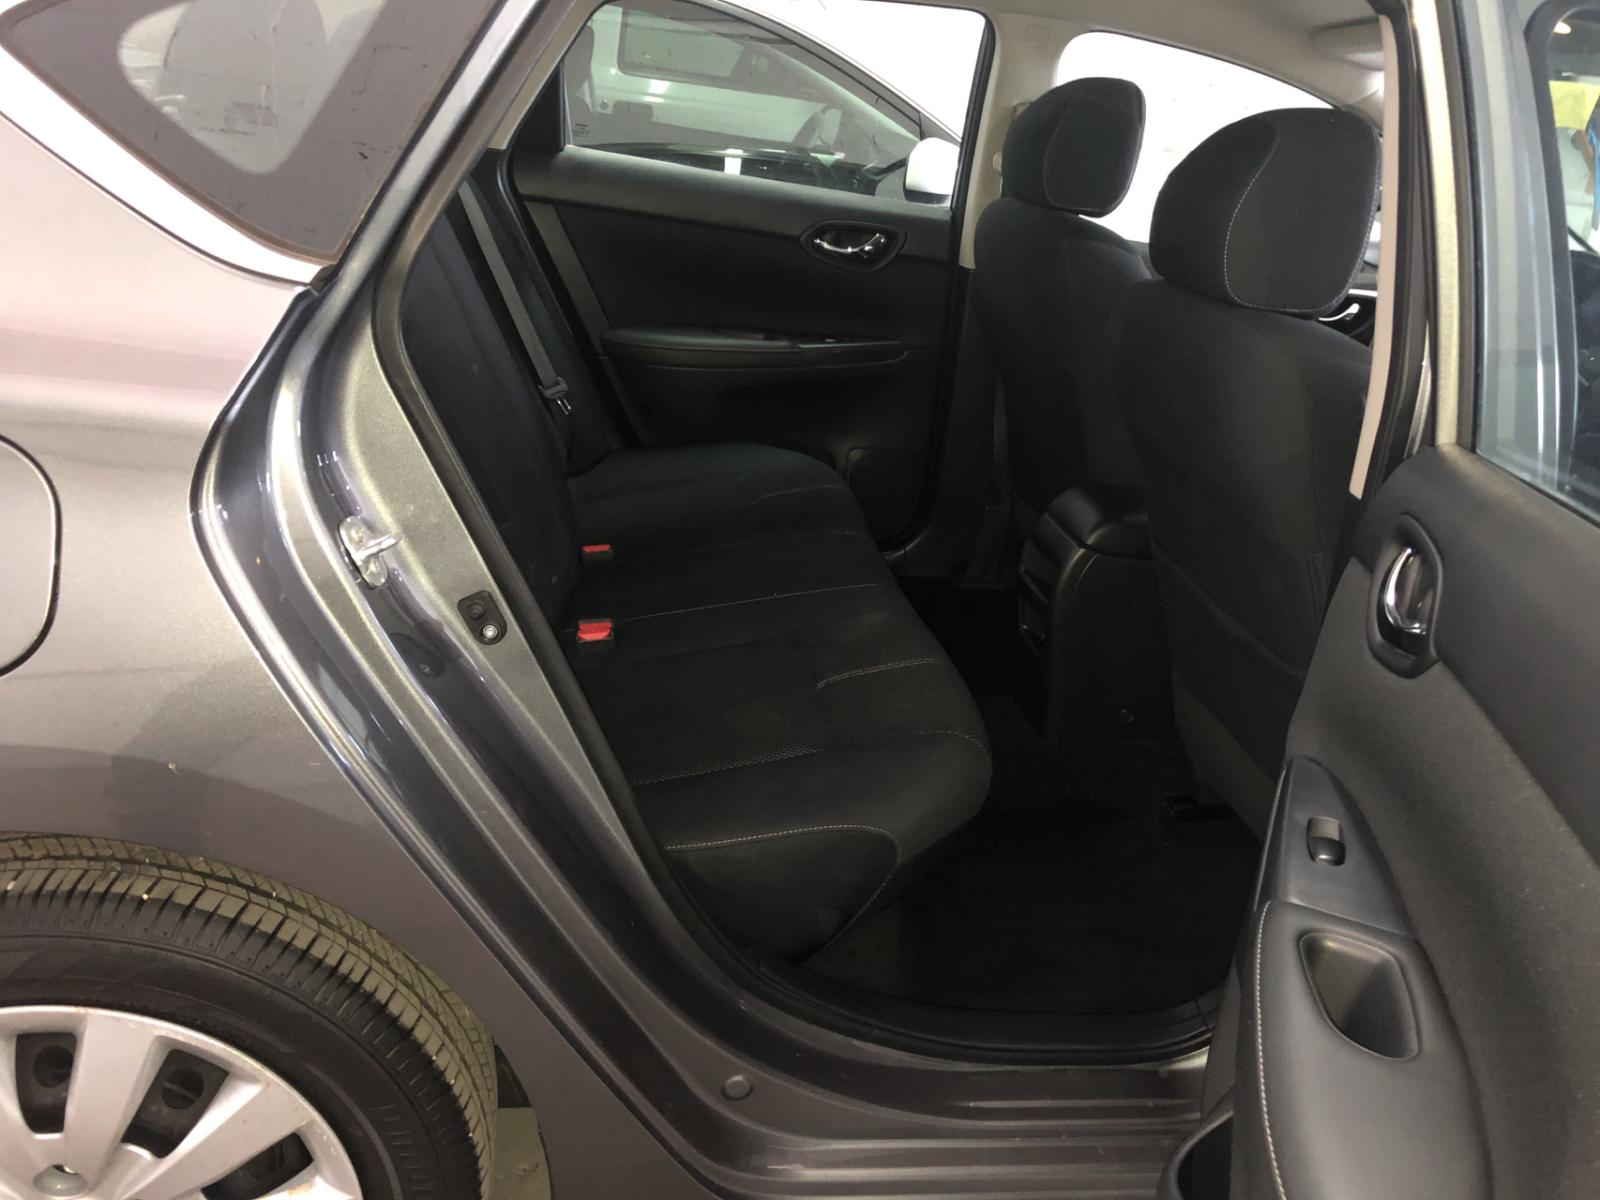 3N1AB7AP7GY245674 - 2016 Nissan Sentra S 1.8L detail view